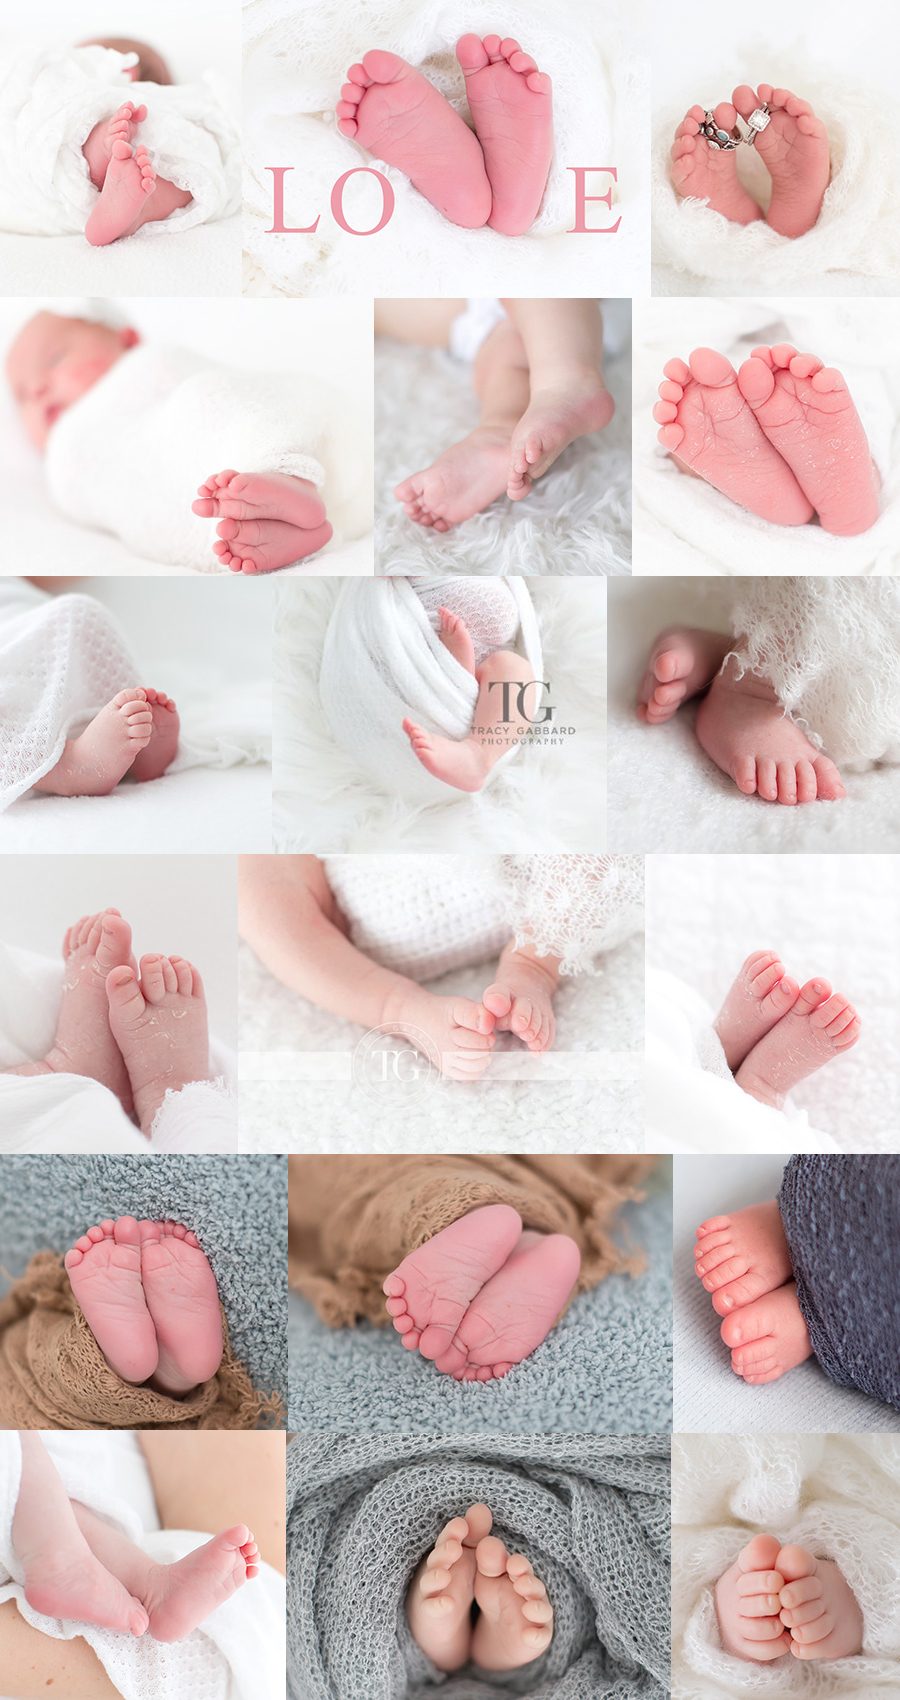 Small, Sweet, Tiny Little Baby Feet - Newborn Photography